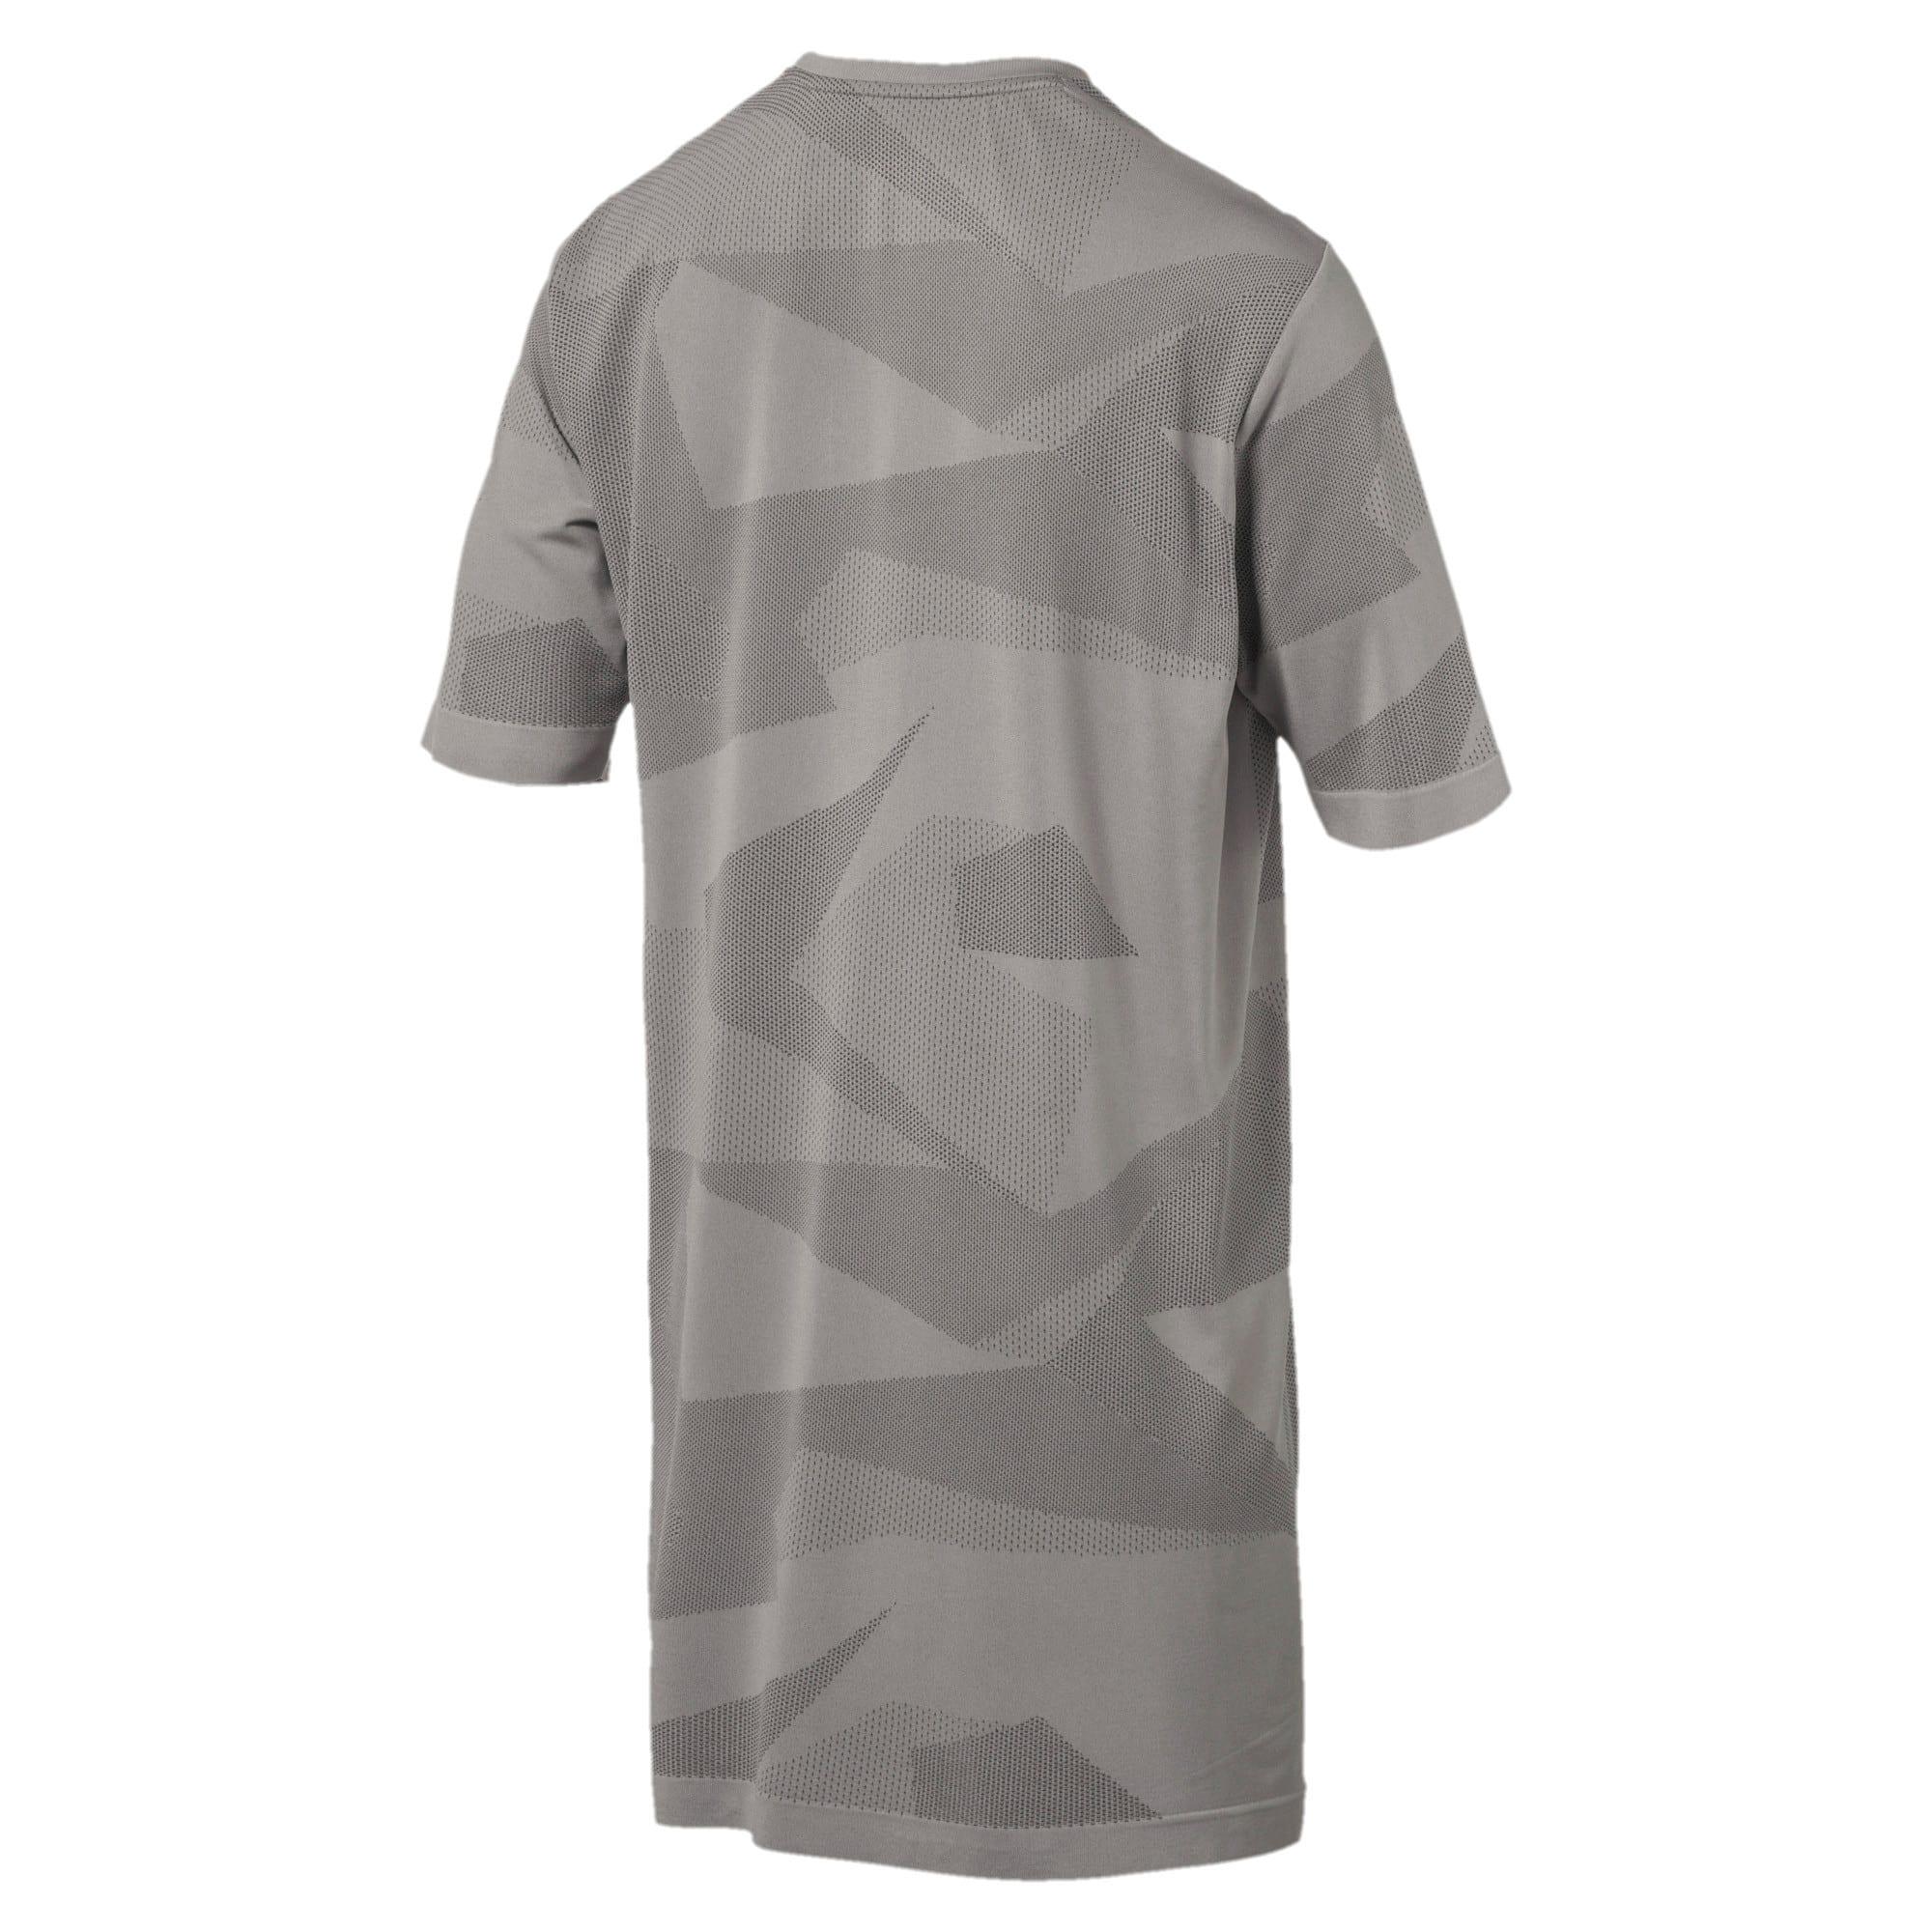 Thumbnail 3 of Evolution Men's evoKNIT Image T-Shirt, Medium Gray Heather, medium-IND